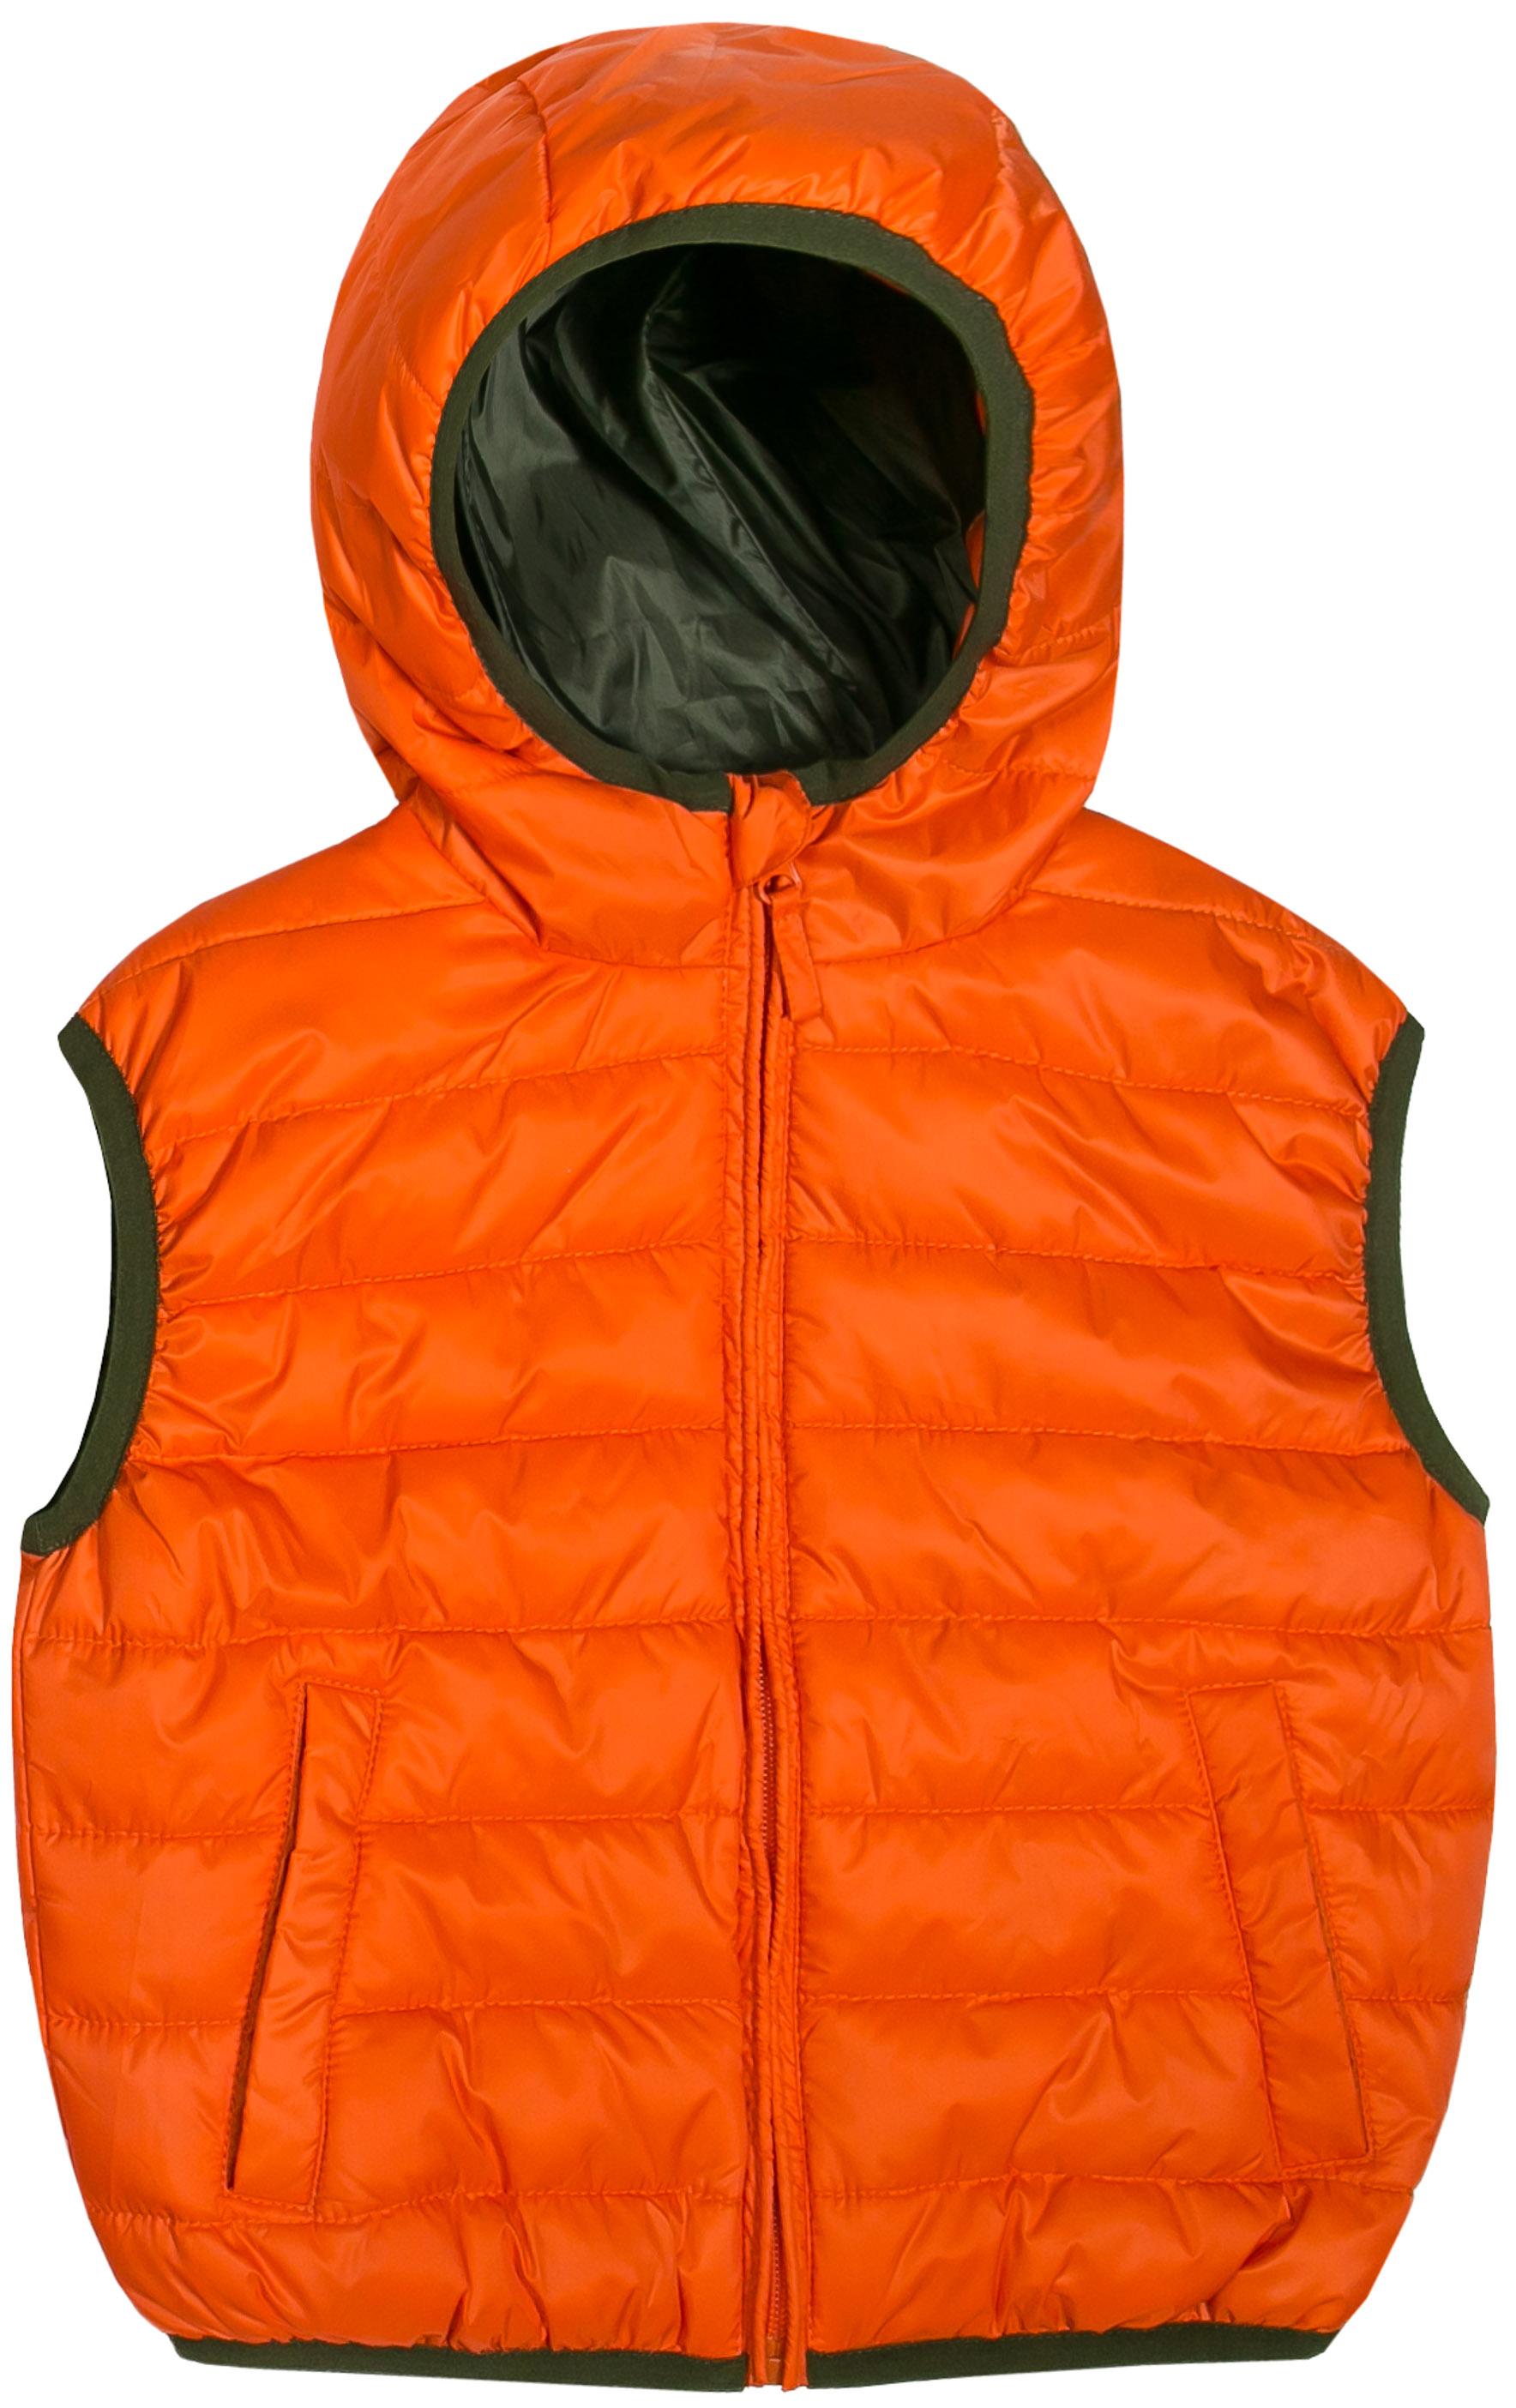 Жилеты Barkito Жилет для мальчика Barkito, оранжевый